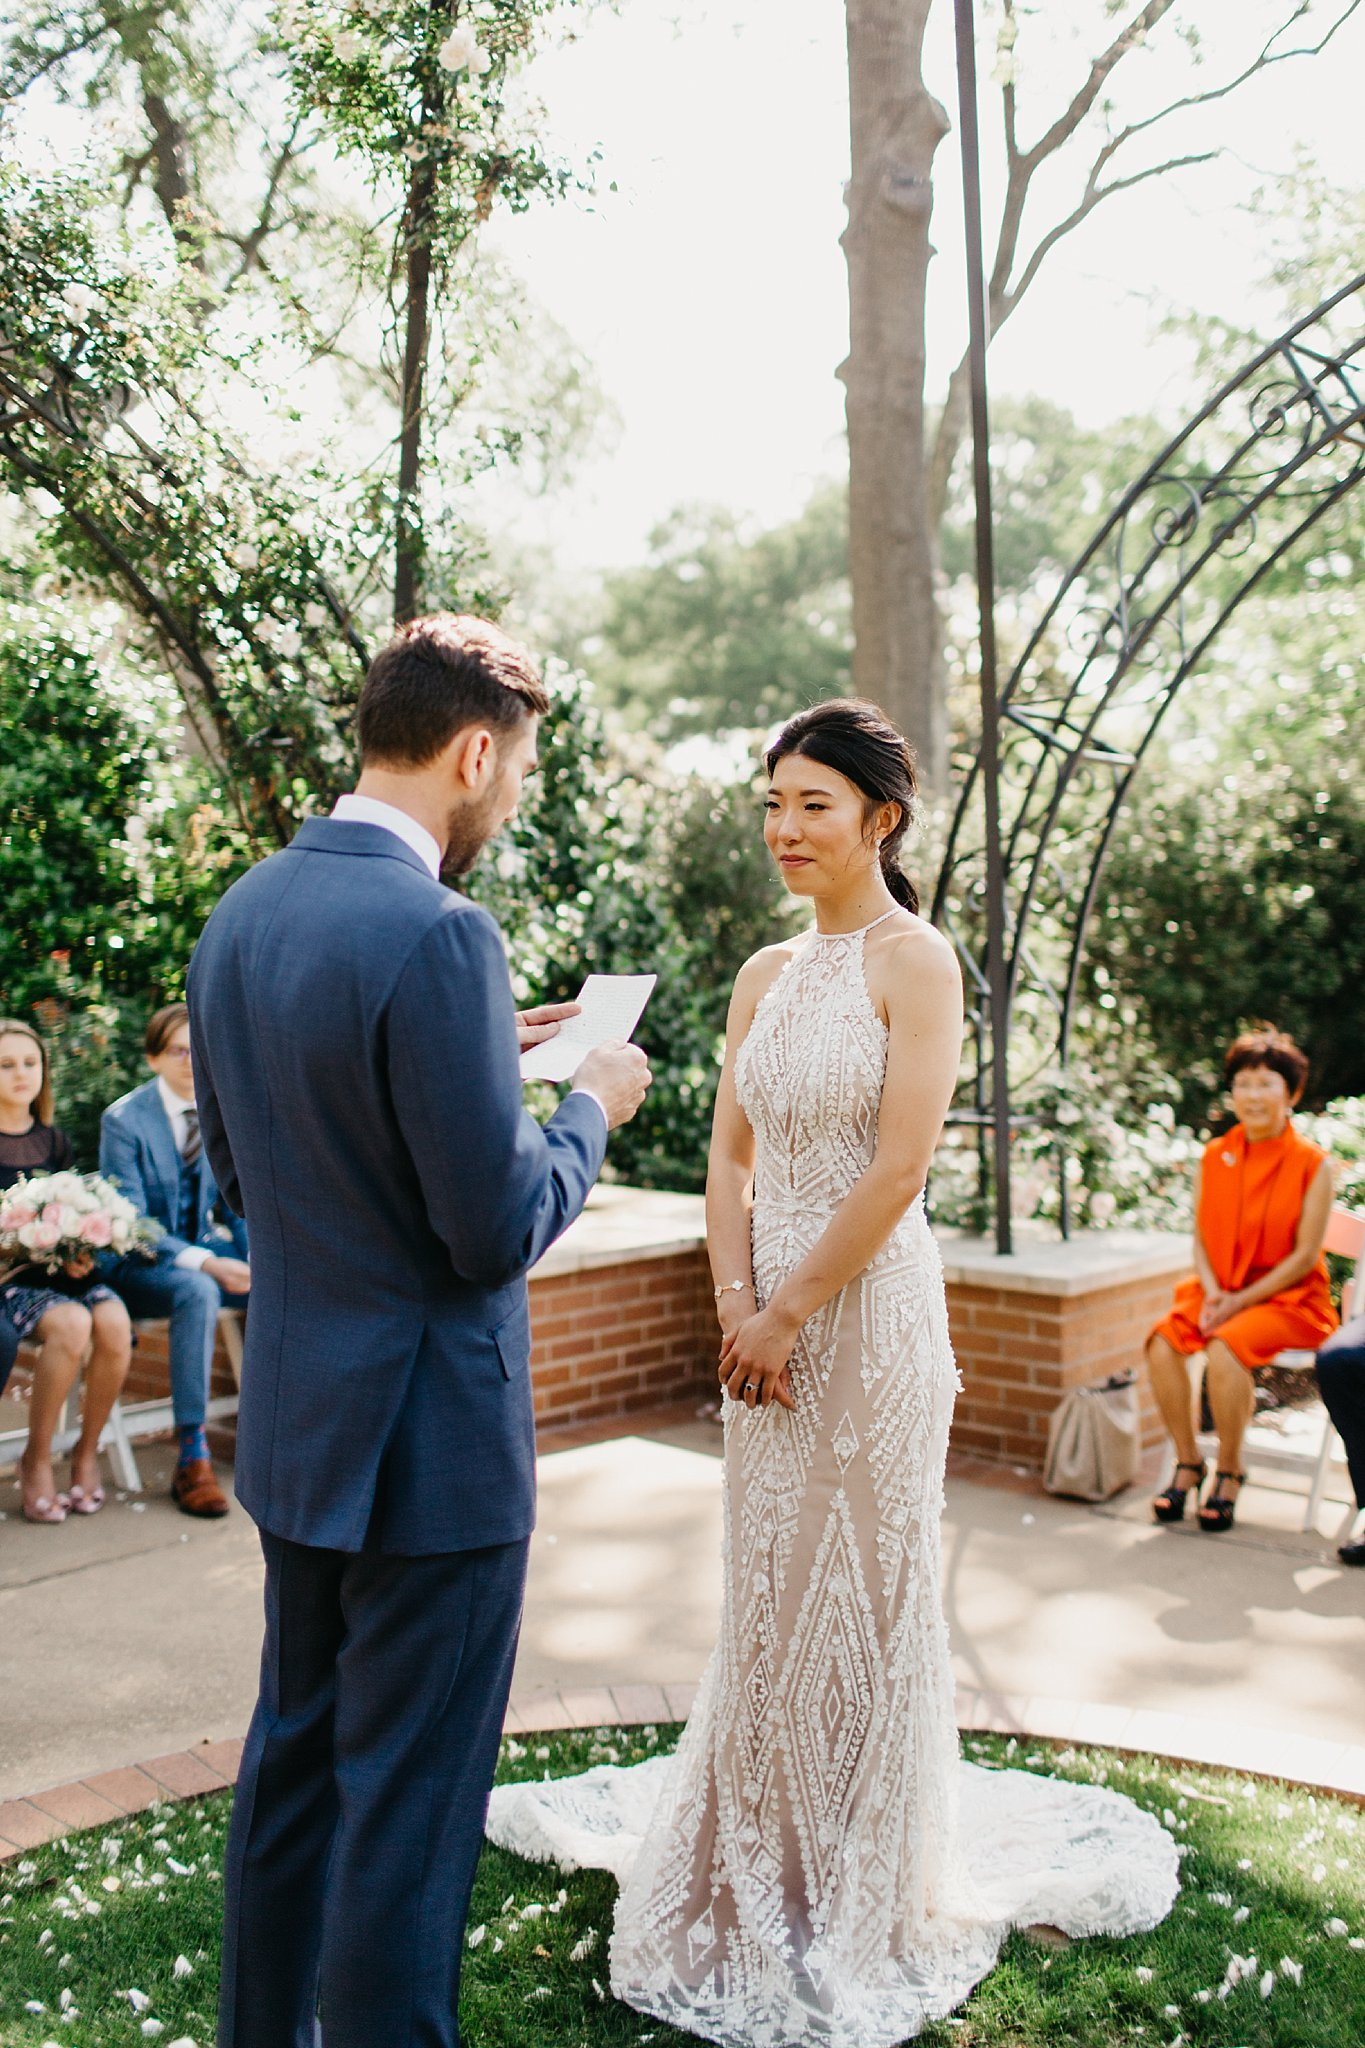 Wilderlove Co_Dallas Texas_Wedding Elopement_Arboretum_Photography_0020.jpg